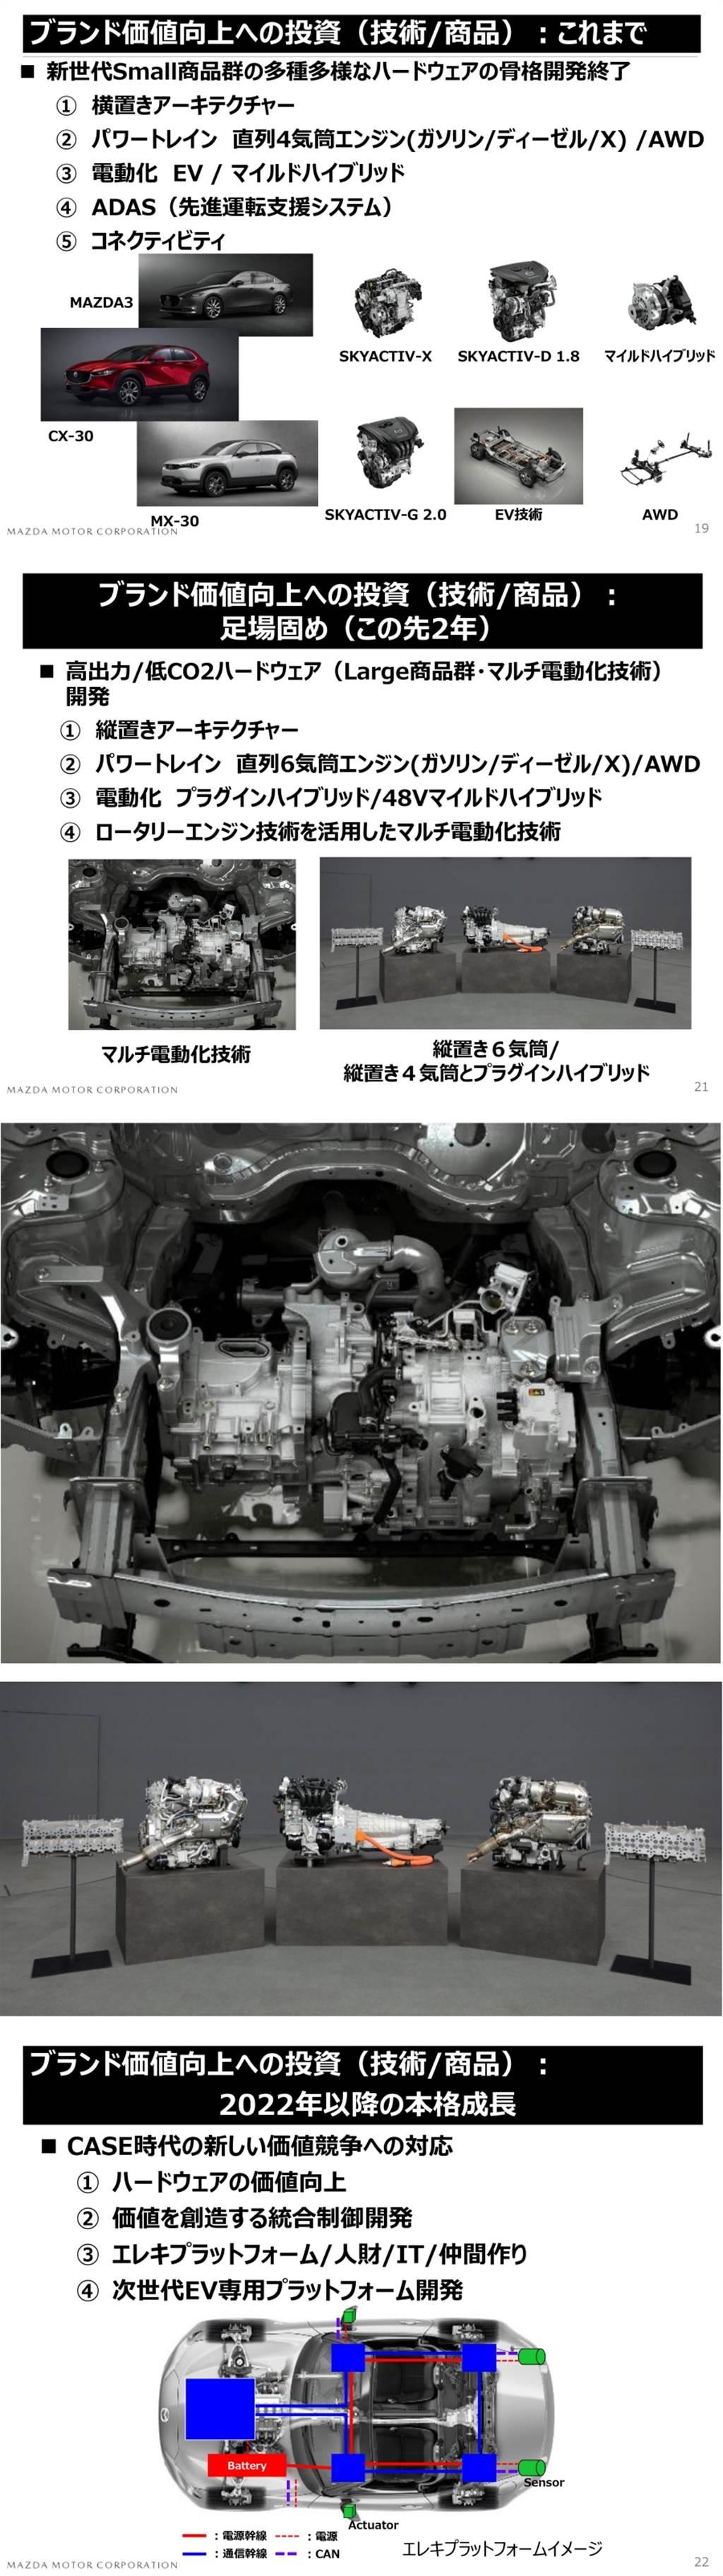 Mazda 公布第二季財報內容,未來投資「大型車商品群」、直六引擎/直四PHEV動力總成公布